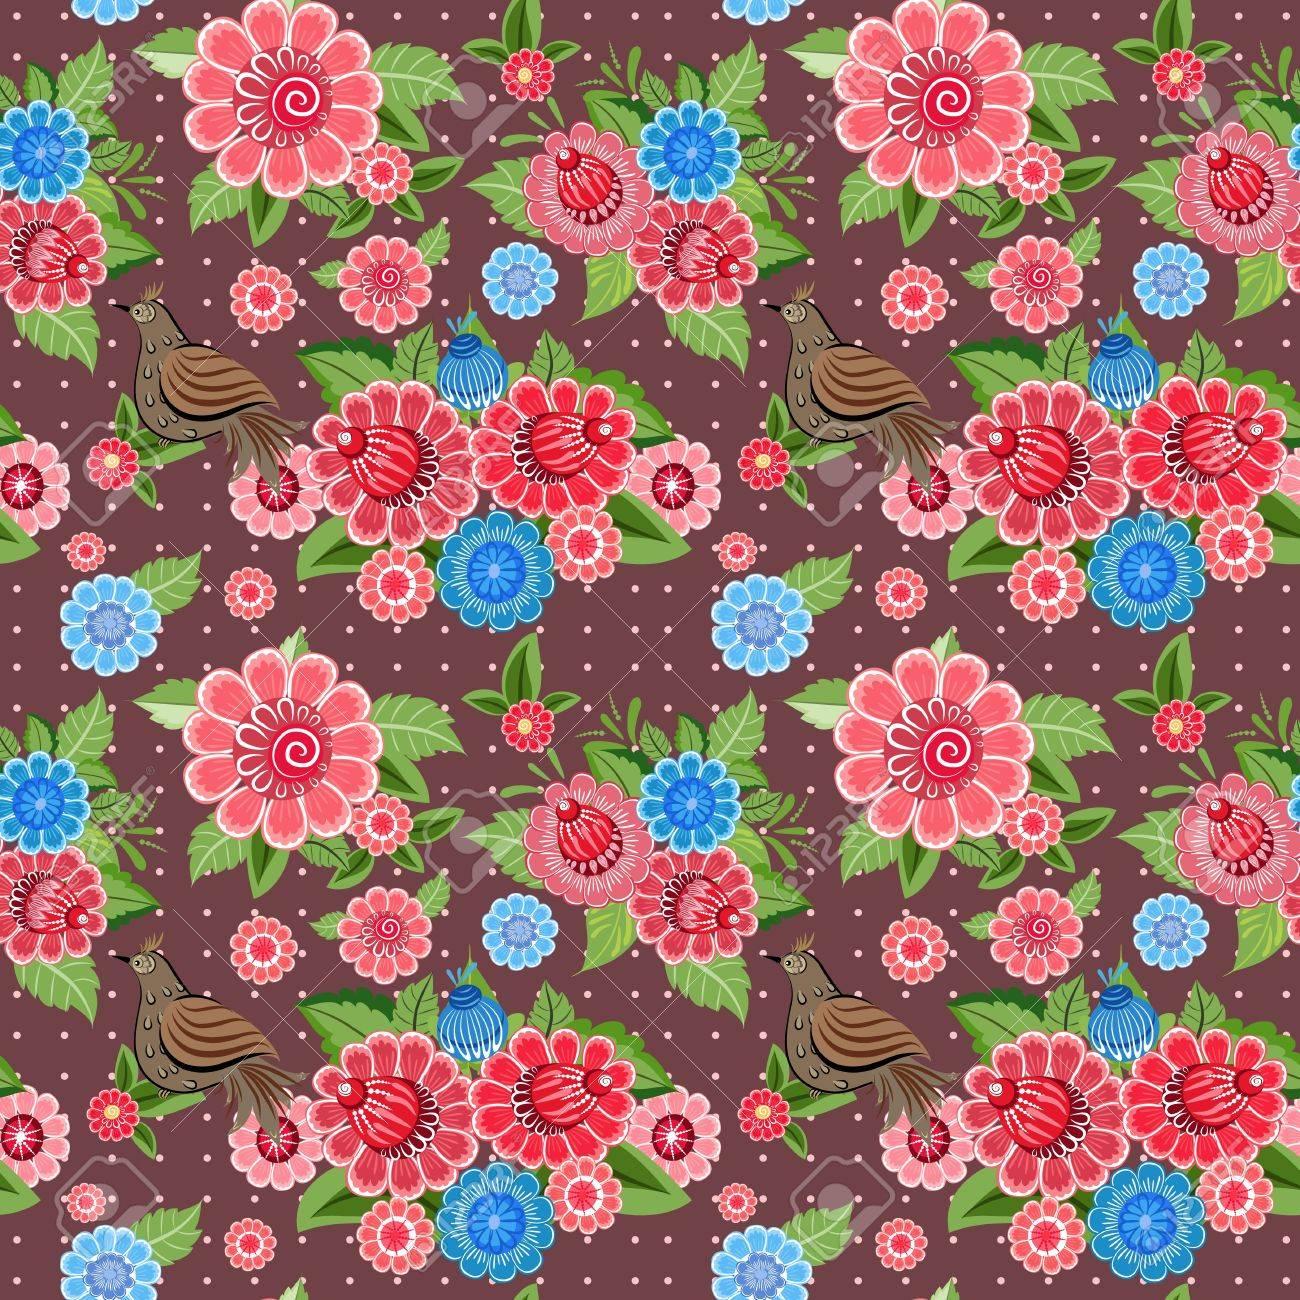 Flower texture with birds seamless Stock Vector - 17550928